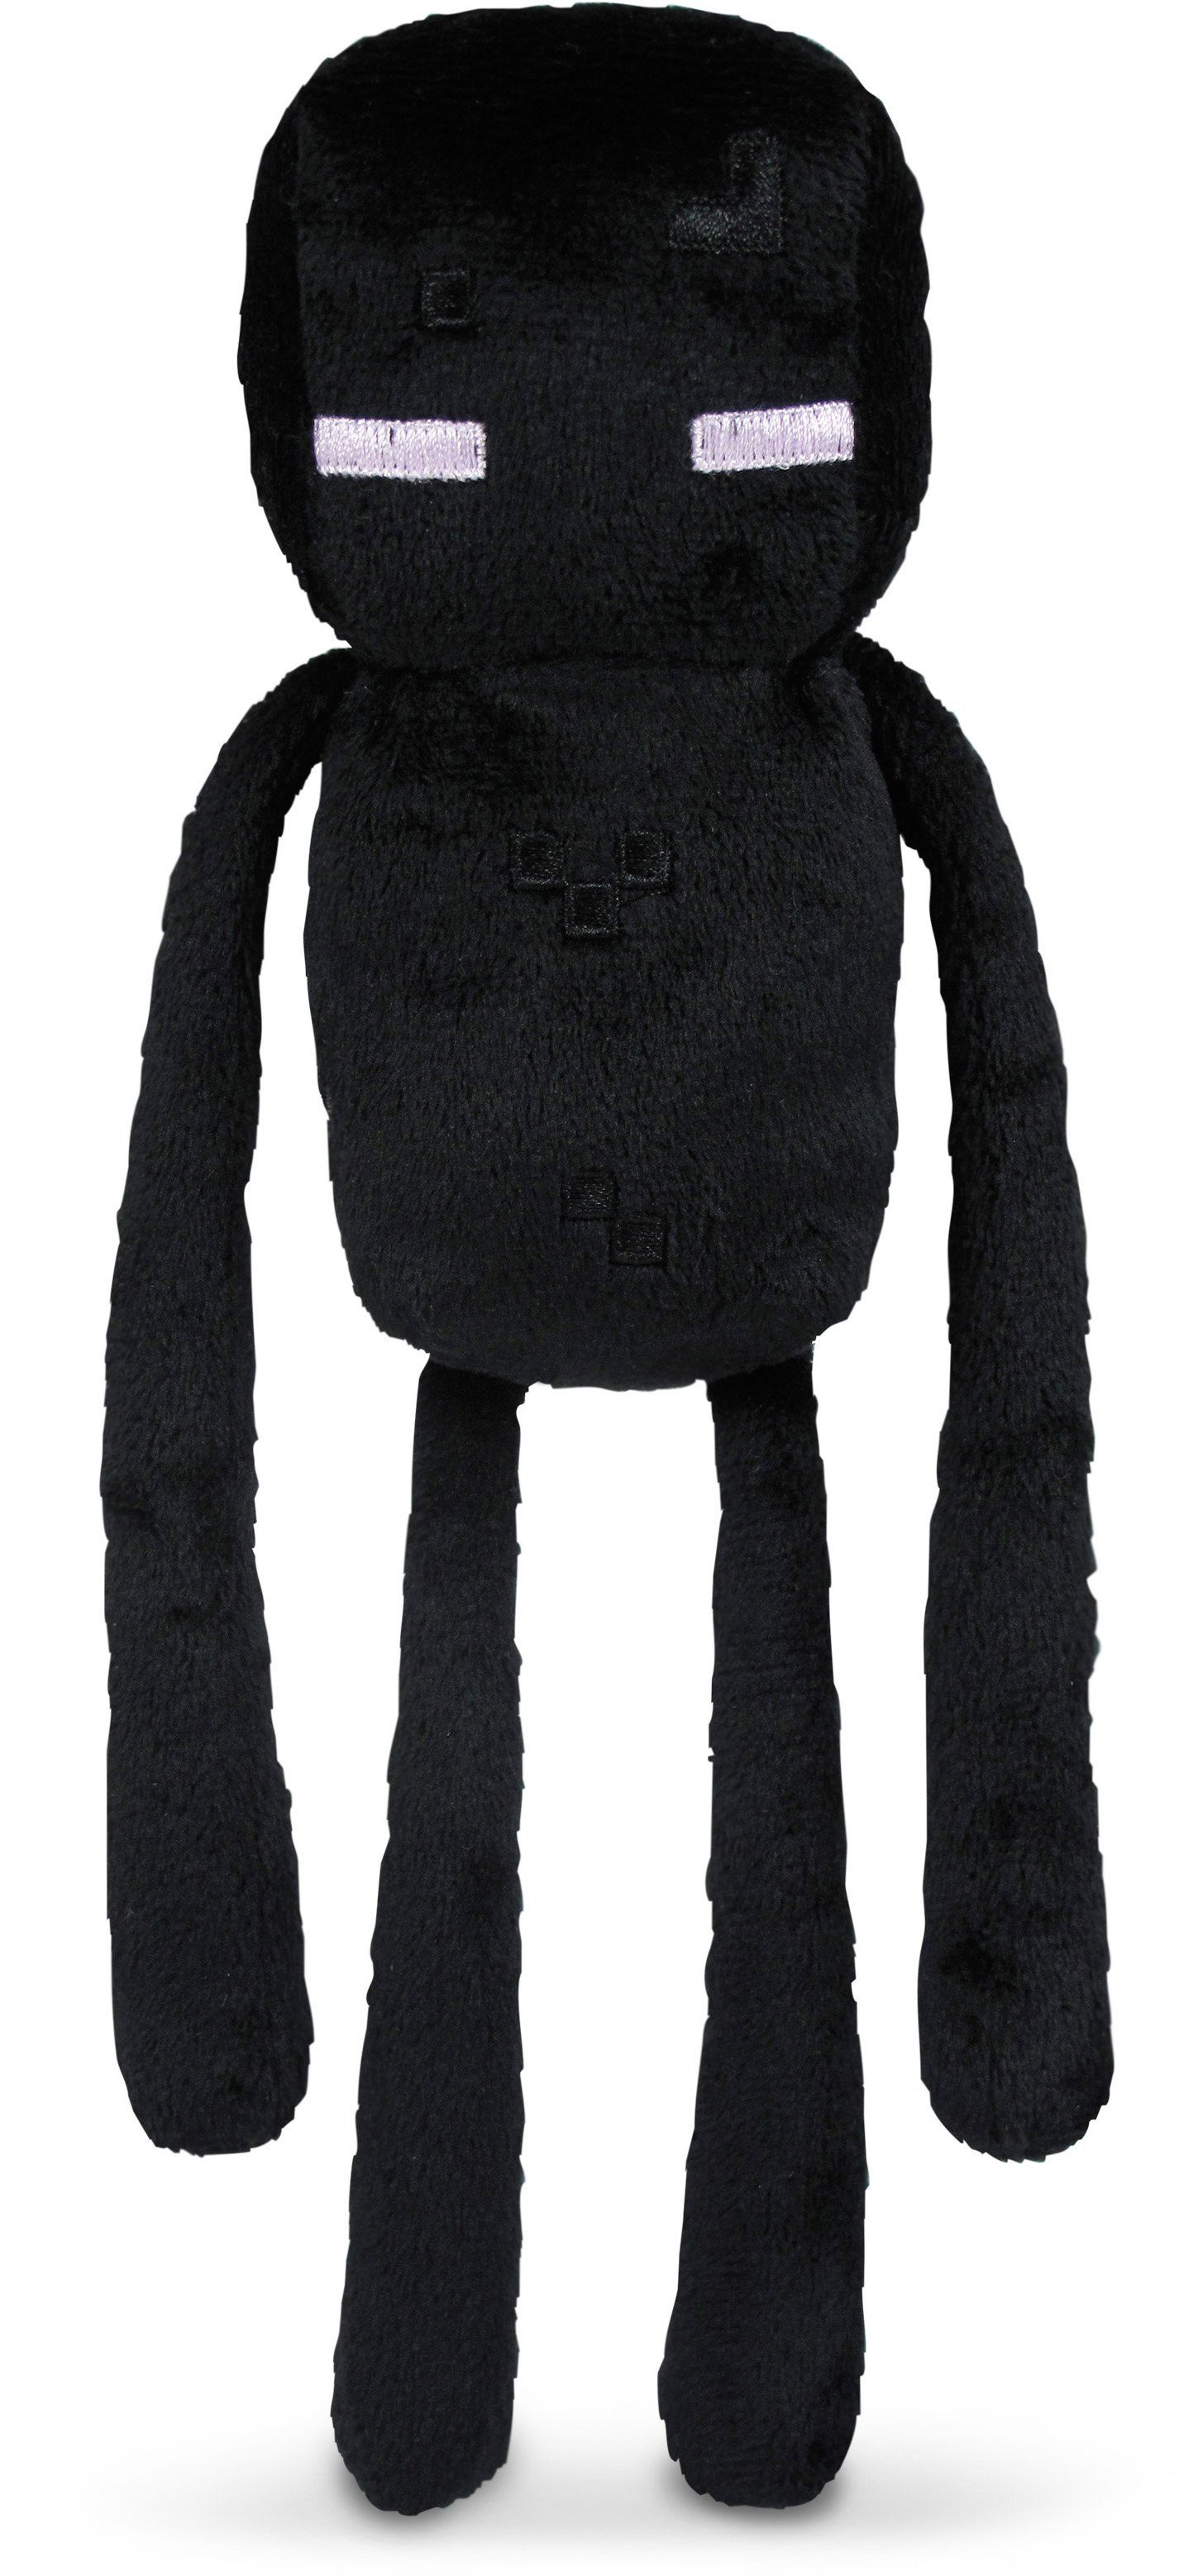 Plüschfigur, »Minecraft, Endermann, ca. 25 cm«